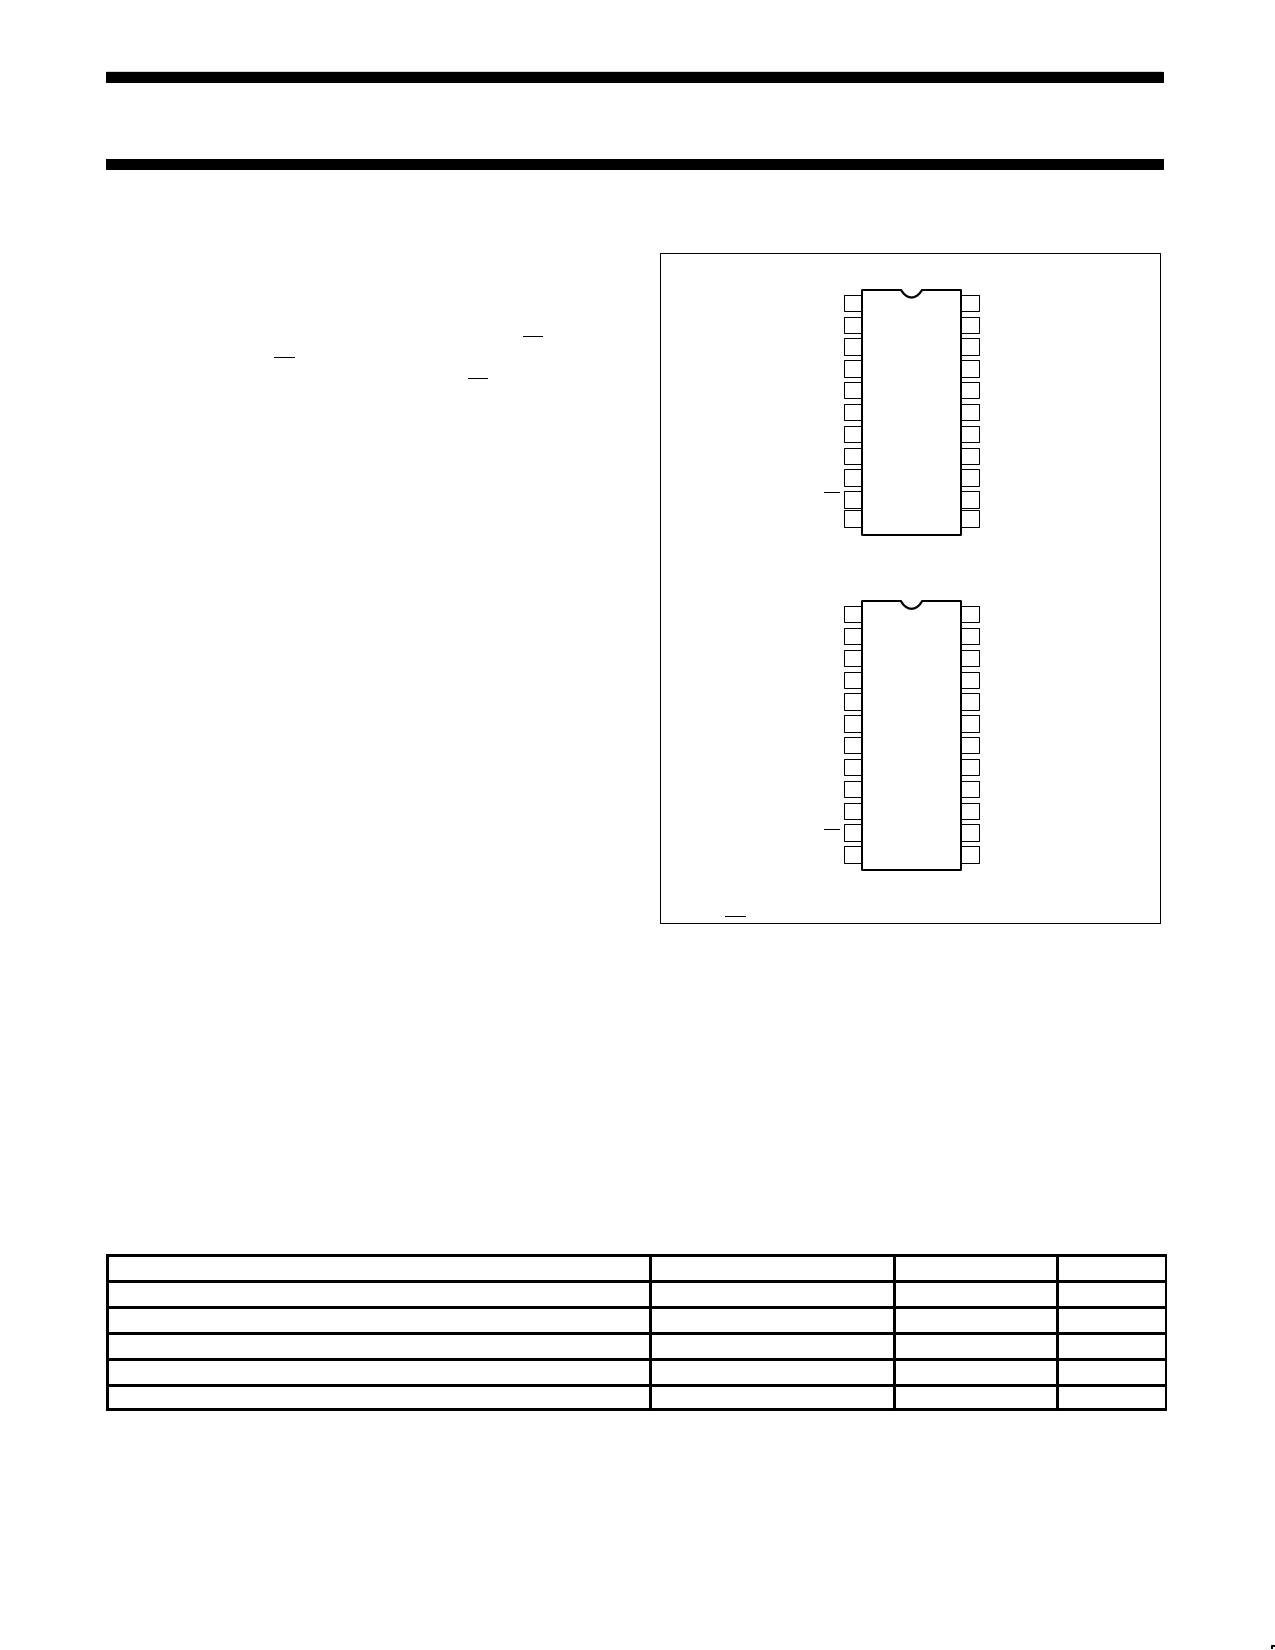 SE5019F 데이터시트 및 SE5019F PDF